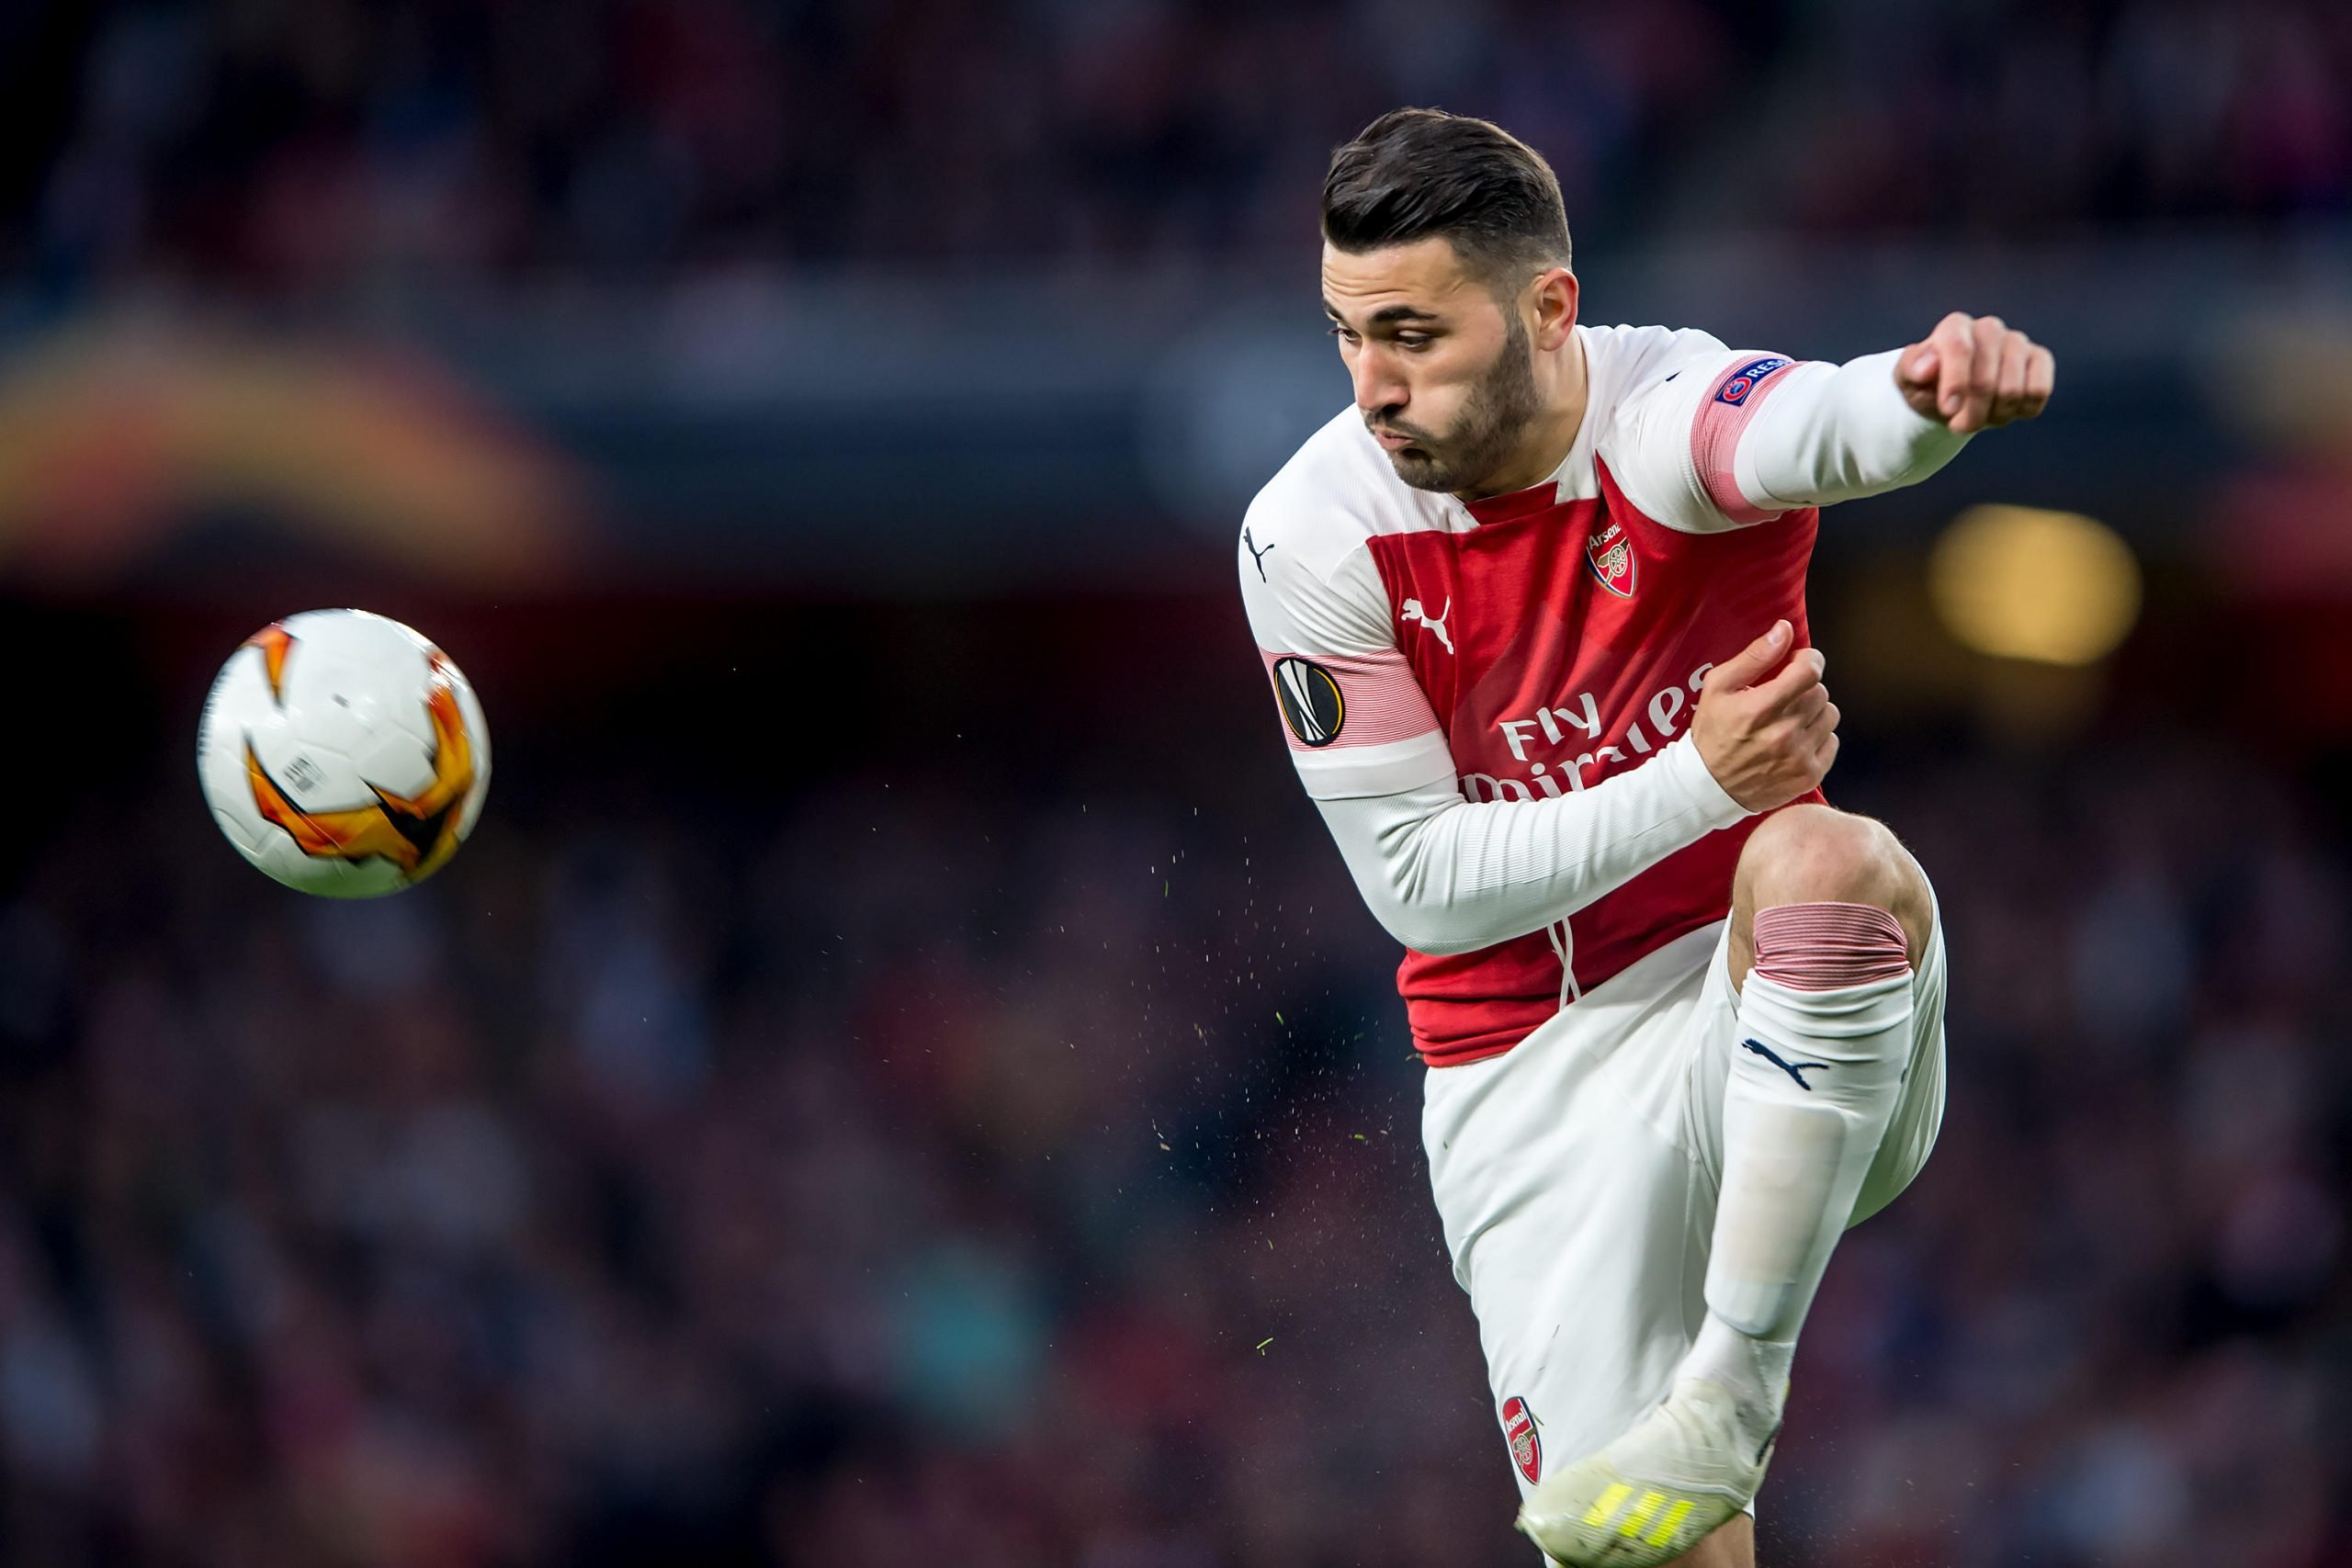 Streama Arsenal – Villarreal: Se live stream & TV (6/5)